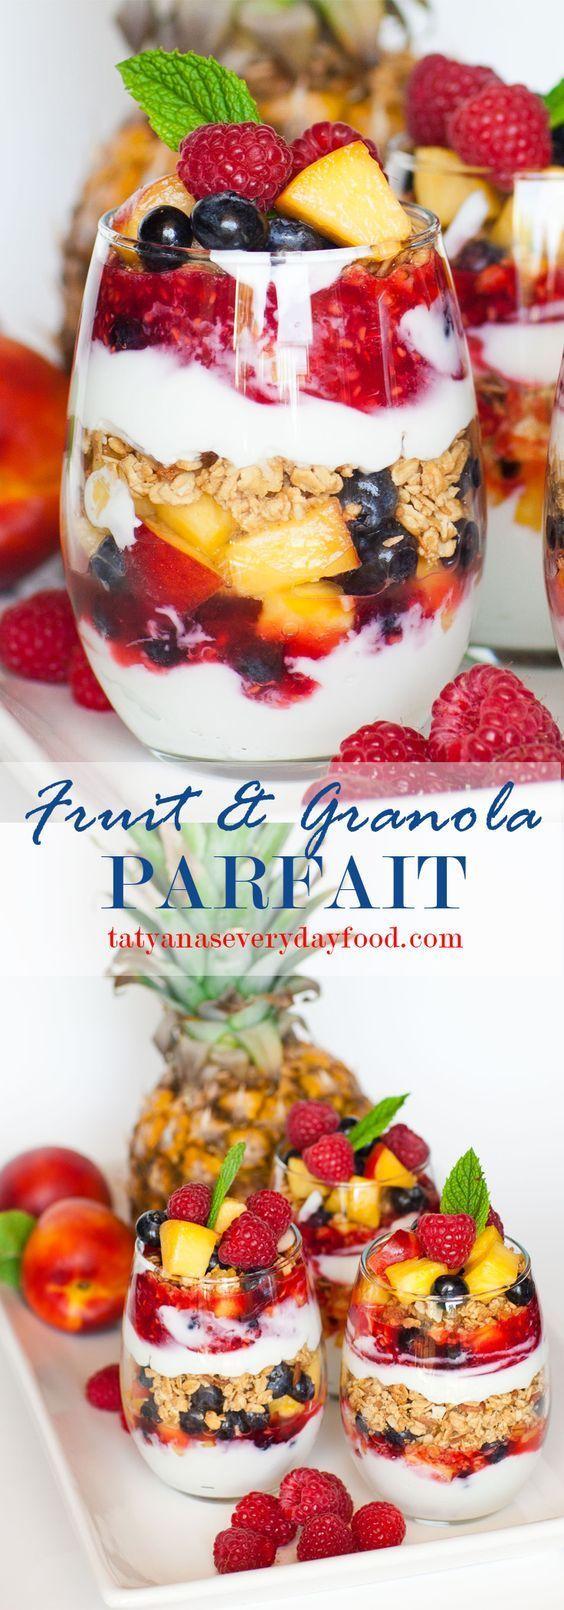 Fruit and Granola Parfait with video recipe - made with Greek yogurt, raspberry sauce, fresh fruit and crunchy granola!